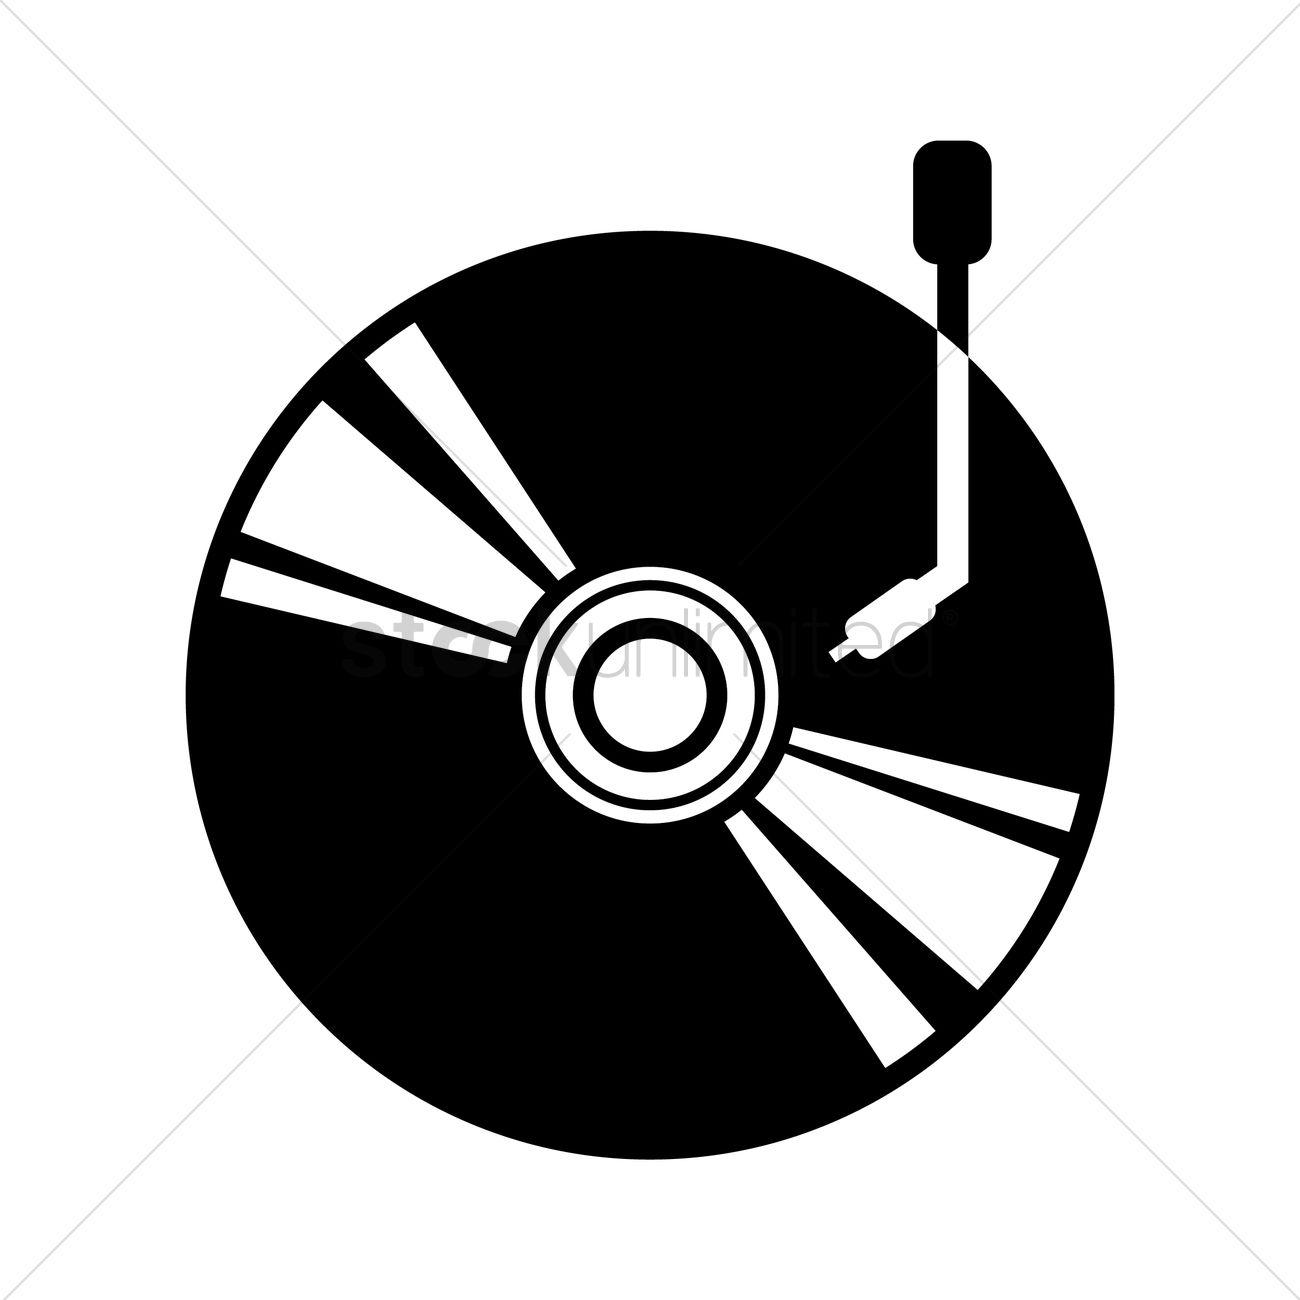 dj turntable vector image 1529280 stockunlimited rh stockunlimited com dj victor ny dj victoria